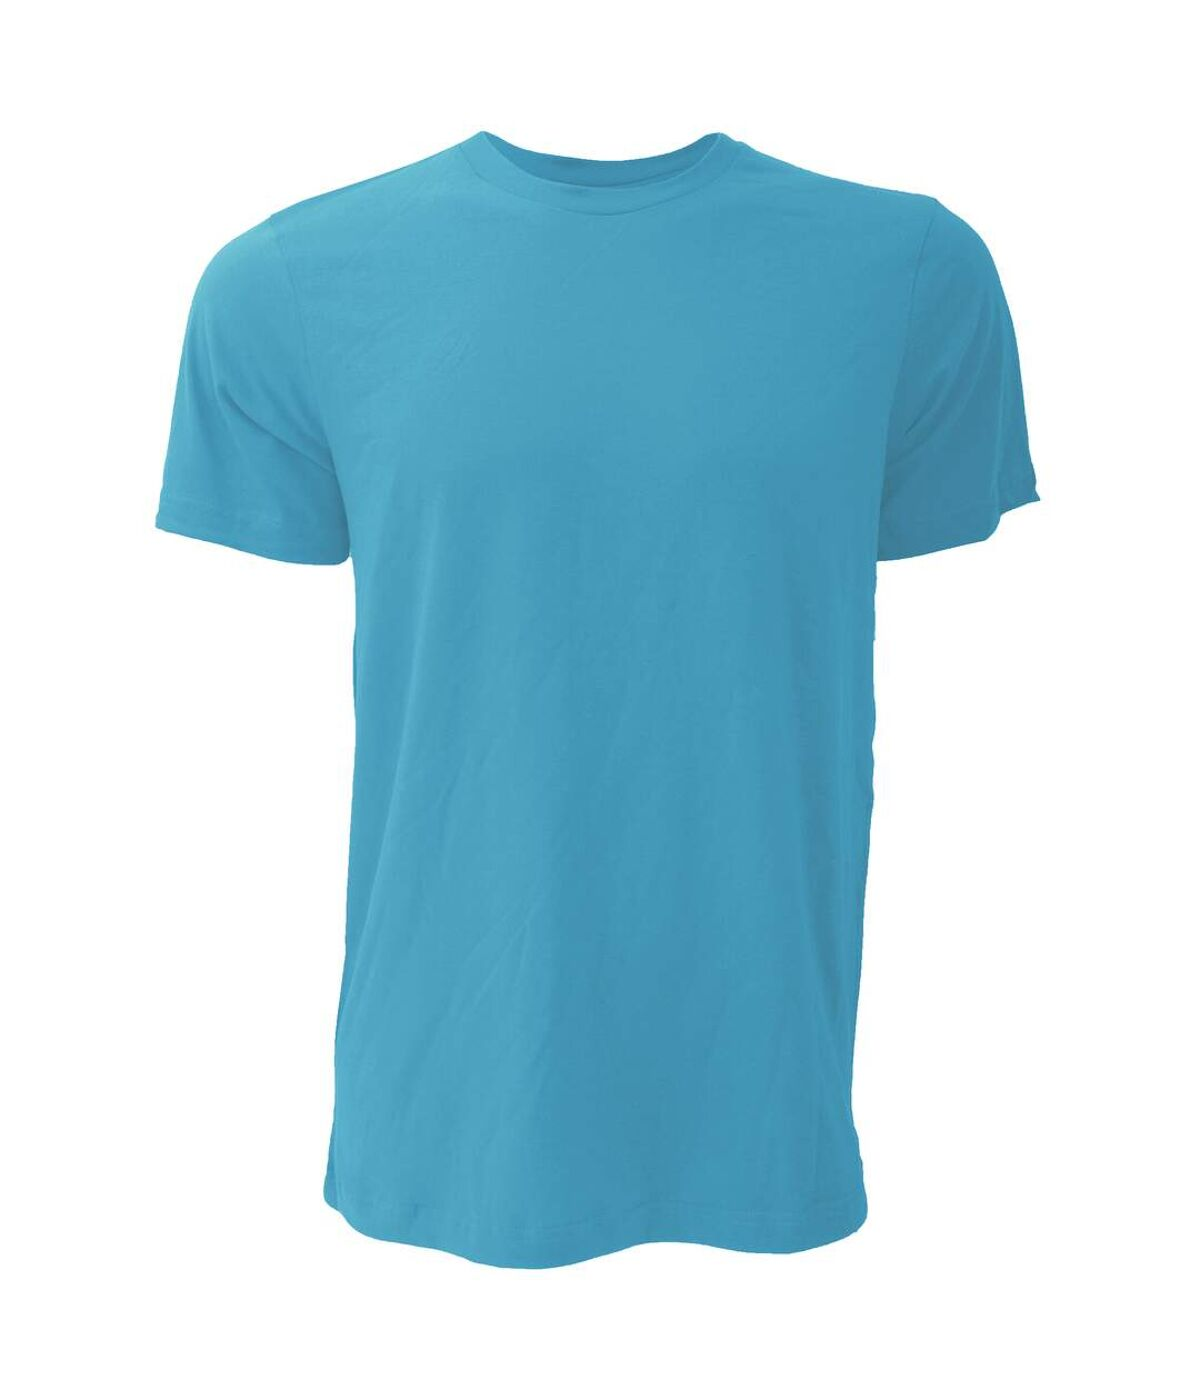 Canvas Unisex Jersey Crew Neck T-Shirt / Mens Short Sleeve T-Shirt (Heather Aqua) - UTBC163